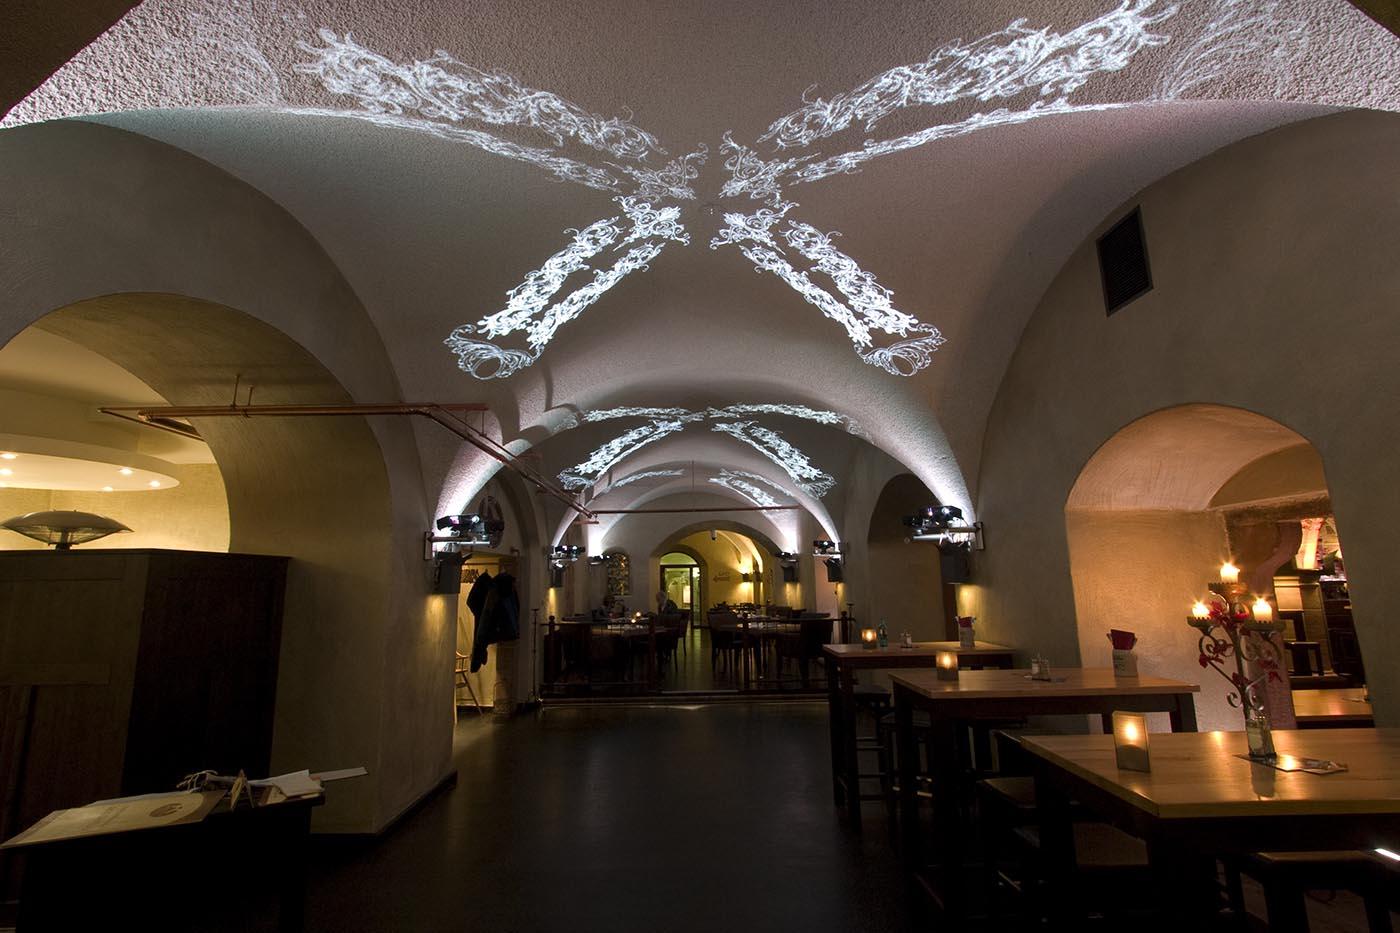 Gewölbe Beleuchtung   Ratskeller Tobias Link Lichtplanung